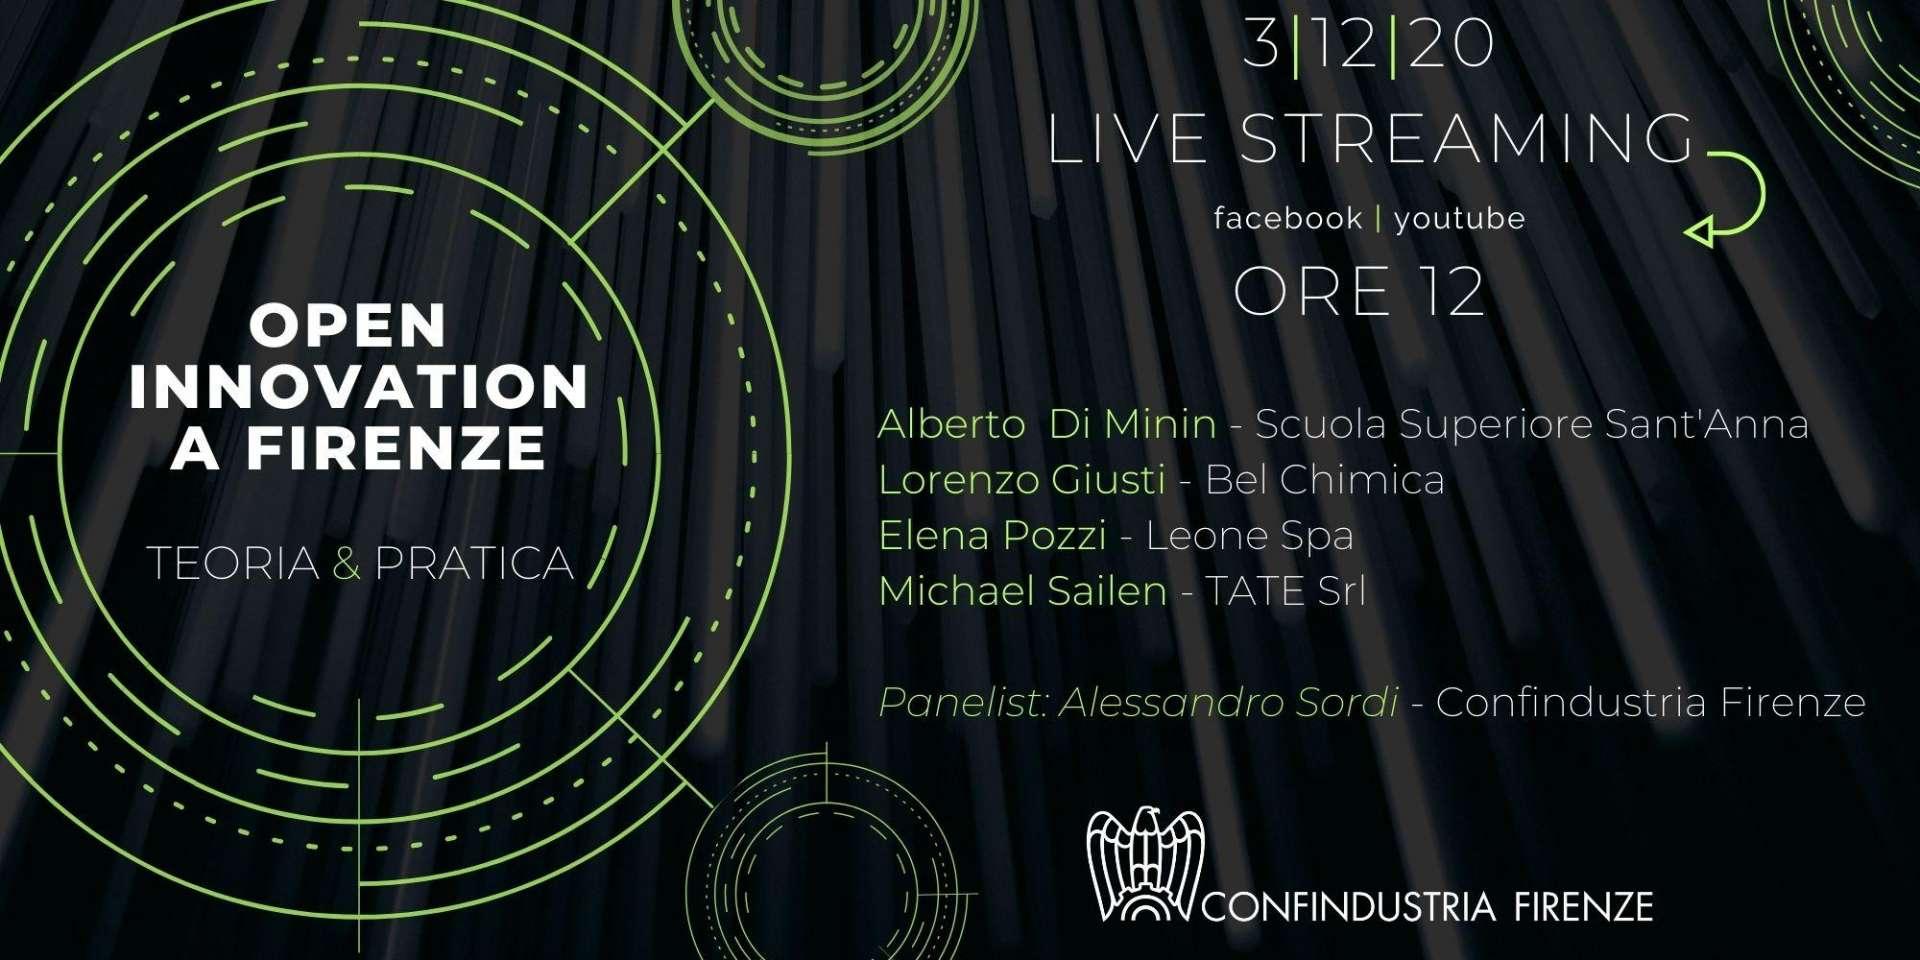 Open Innovation a Firenze: teoria & pratica